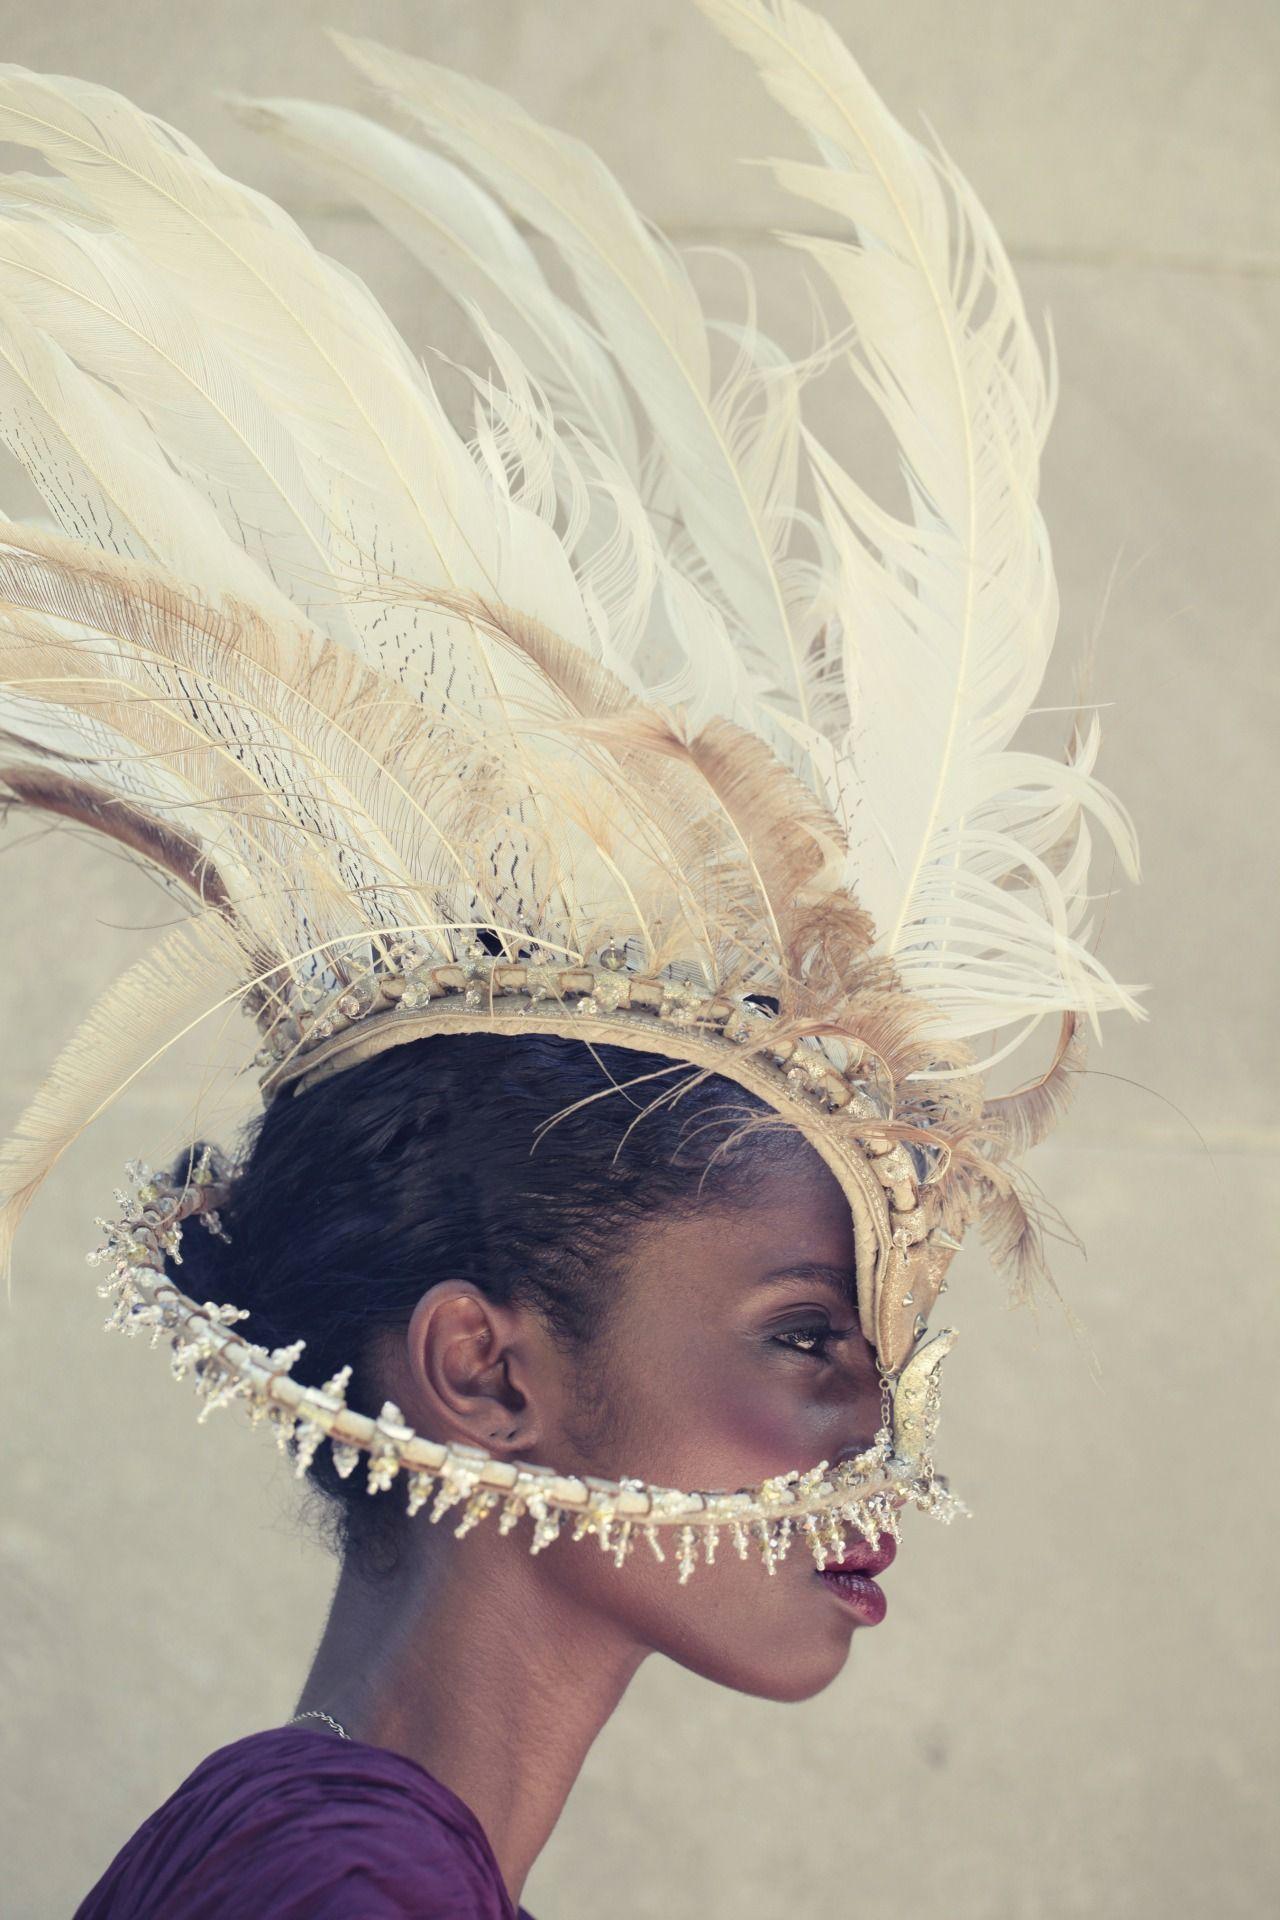 #photography #hannansaleh Muse: @crystalnoriega At @elitemodels Stylist @kardiawilliams Makeup @lilliamartinez #fashionphotgraphy #editorial #regal